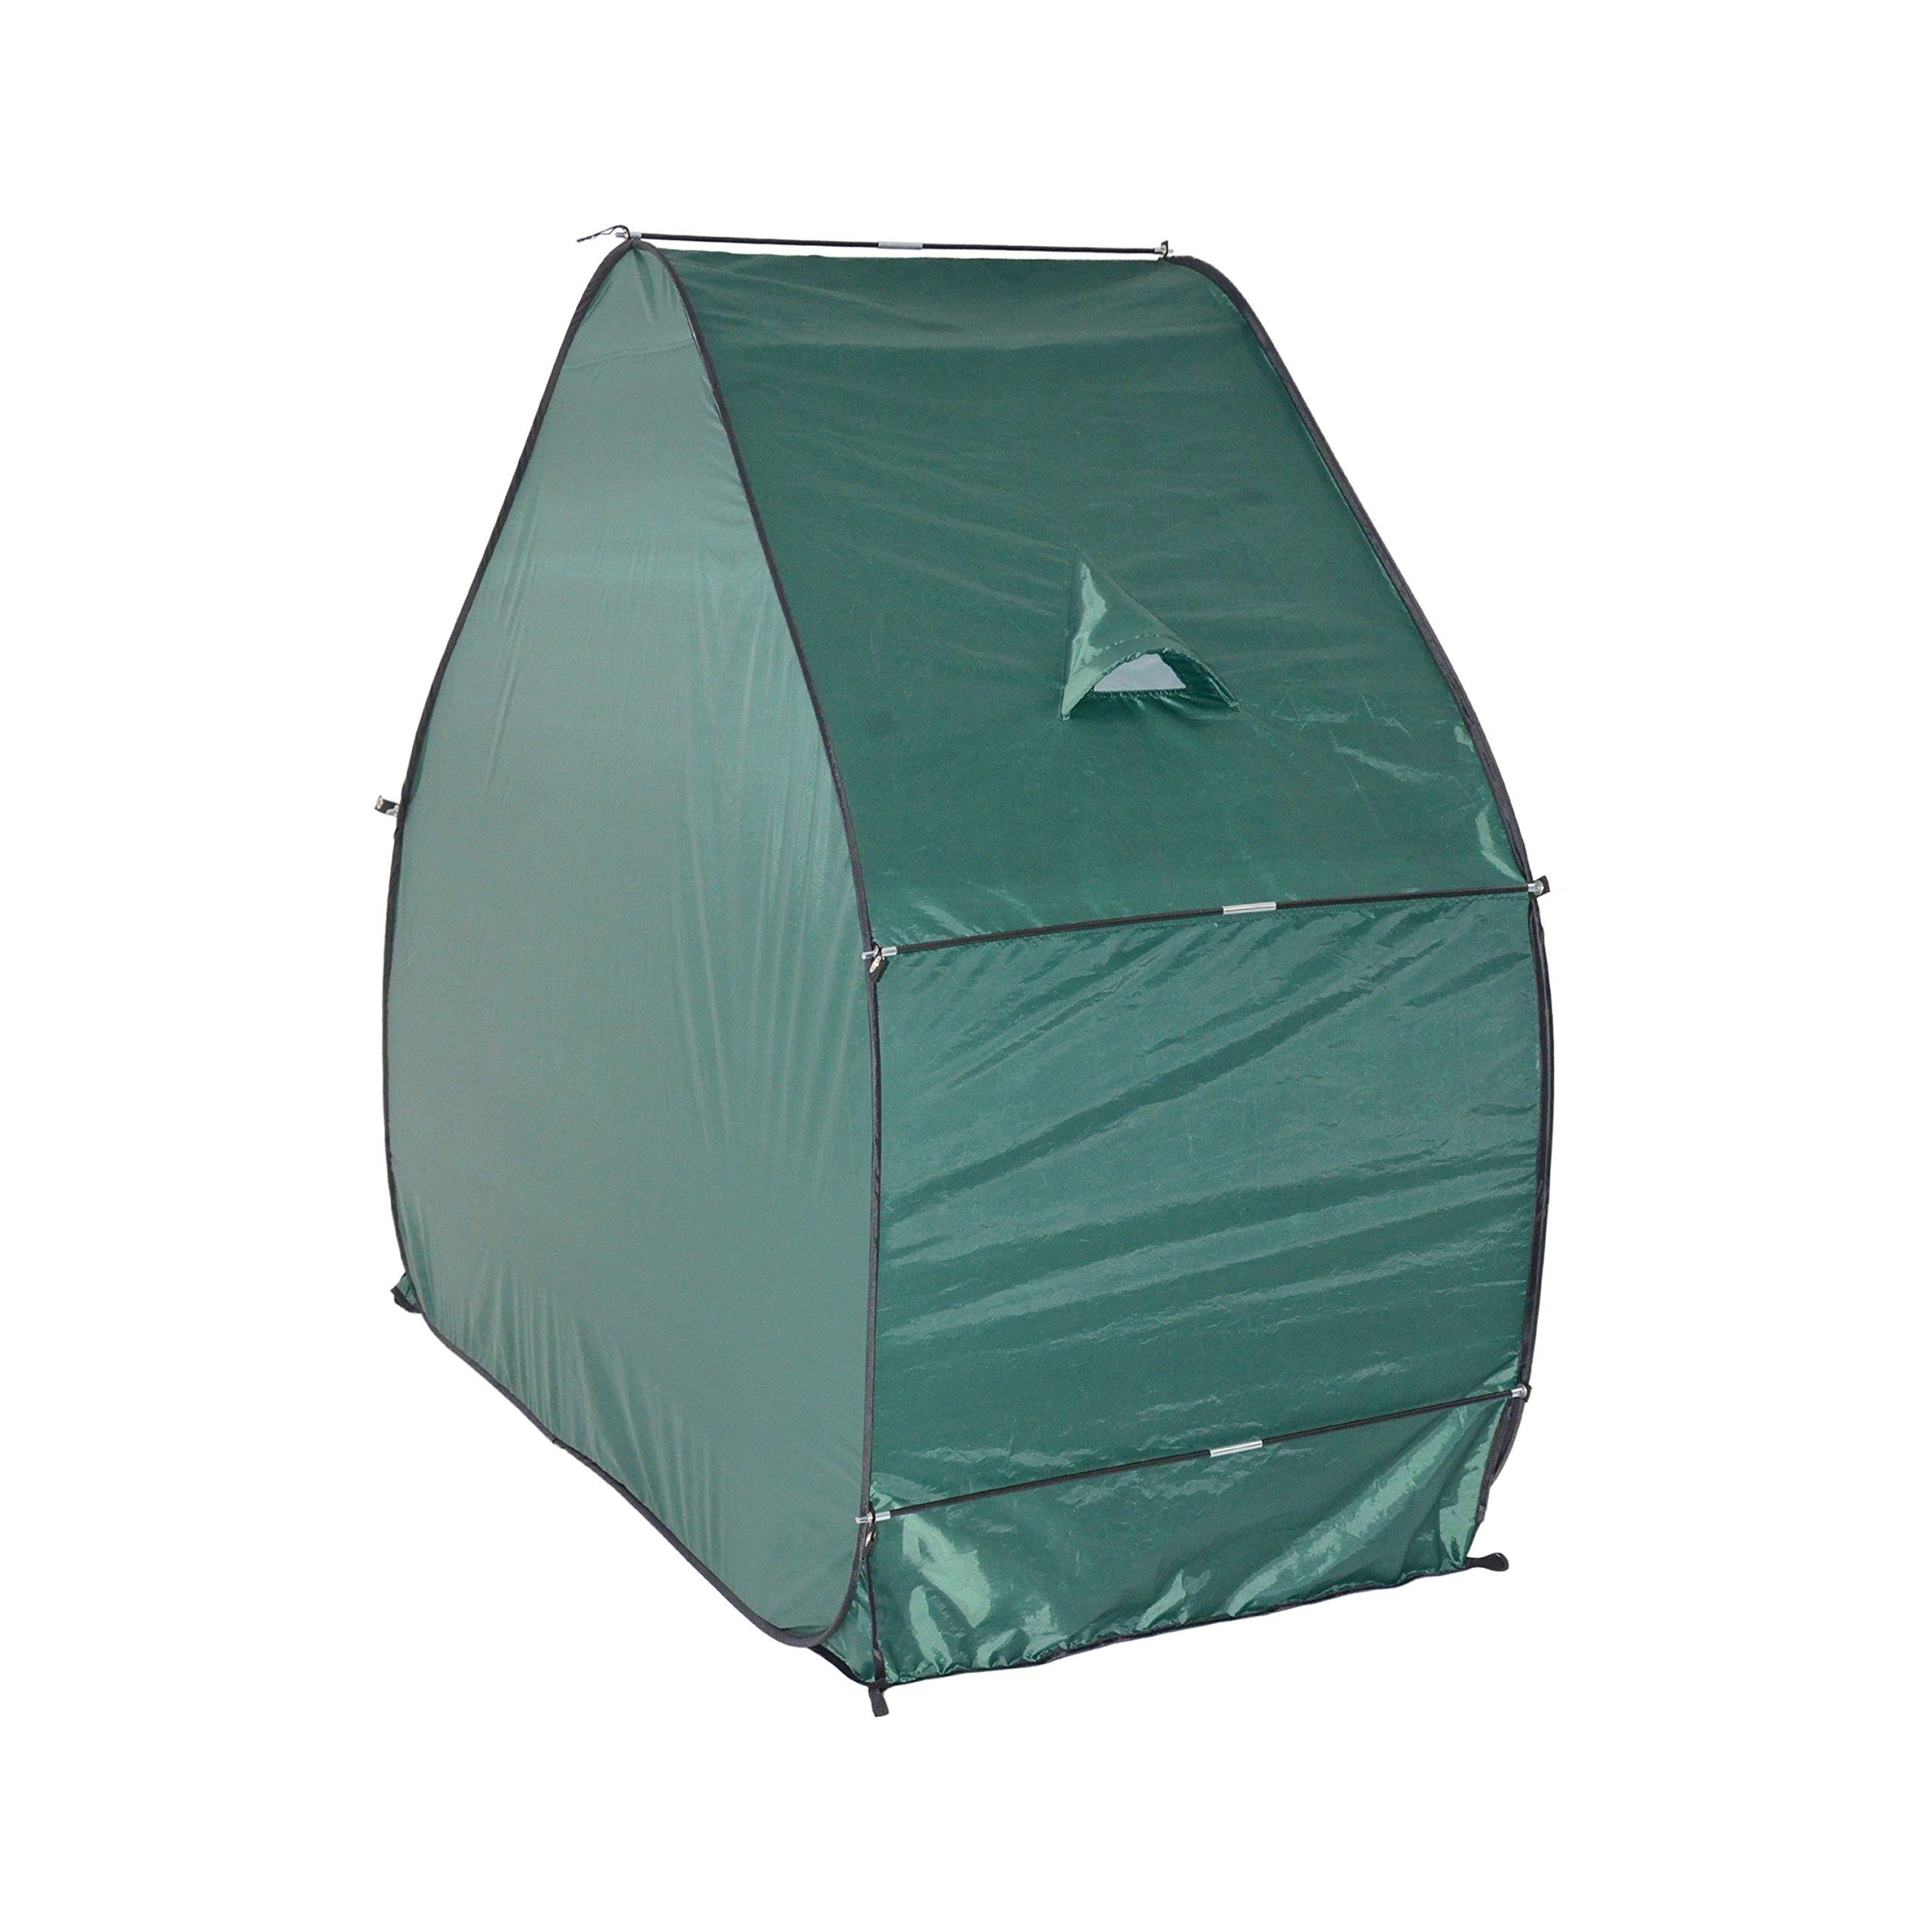 ALEKO BSP79GR Pop-Up Weather Resistant Bike Storage Tent, Green by ALEKO